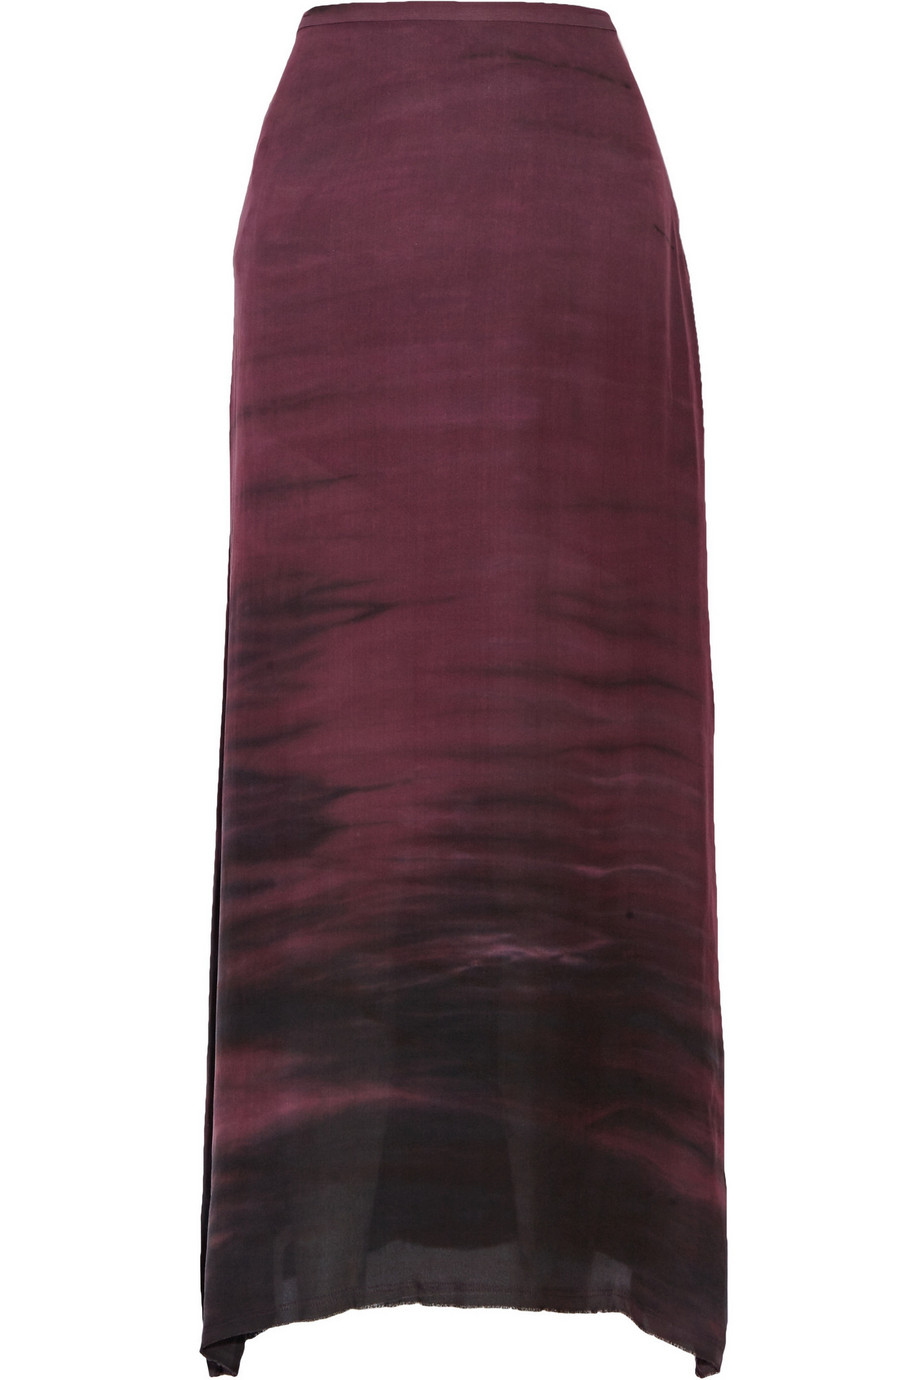 Raquel Allegra Sunset Tie-Dyed Washed-Silk Crepe Maxi Skirt, Plum, Women's, Size: 1